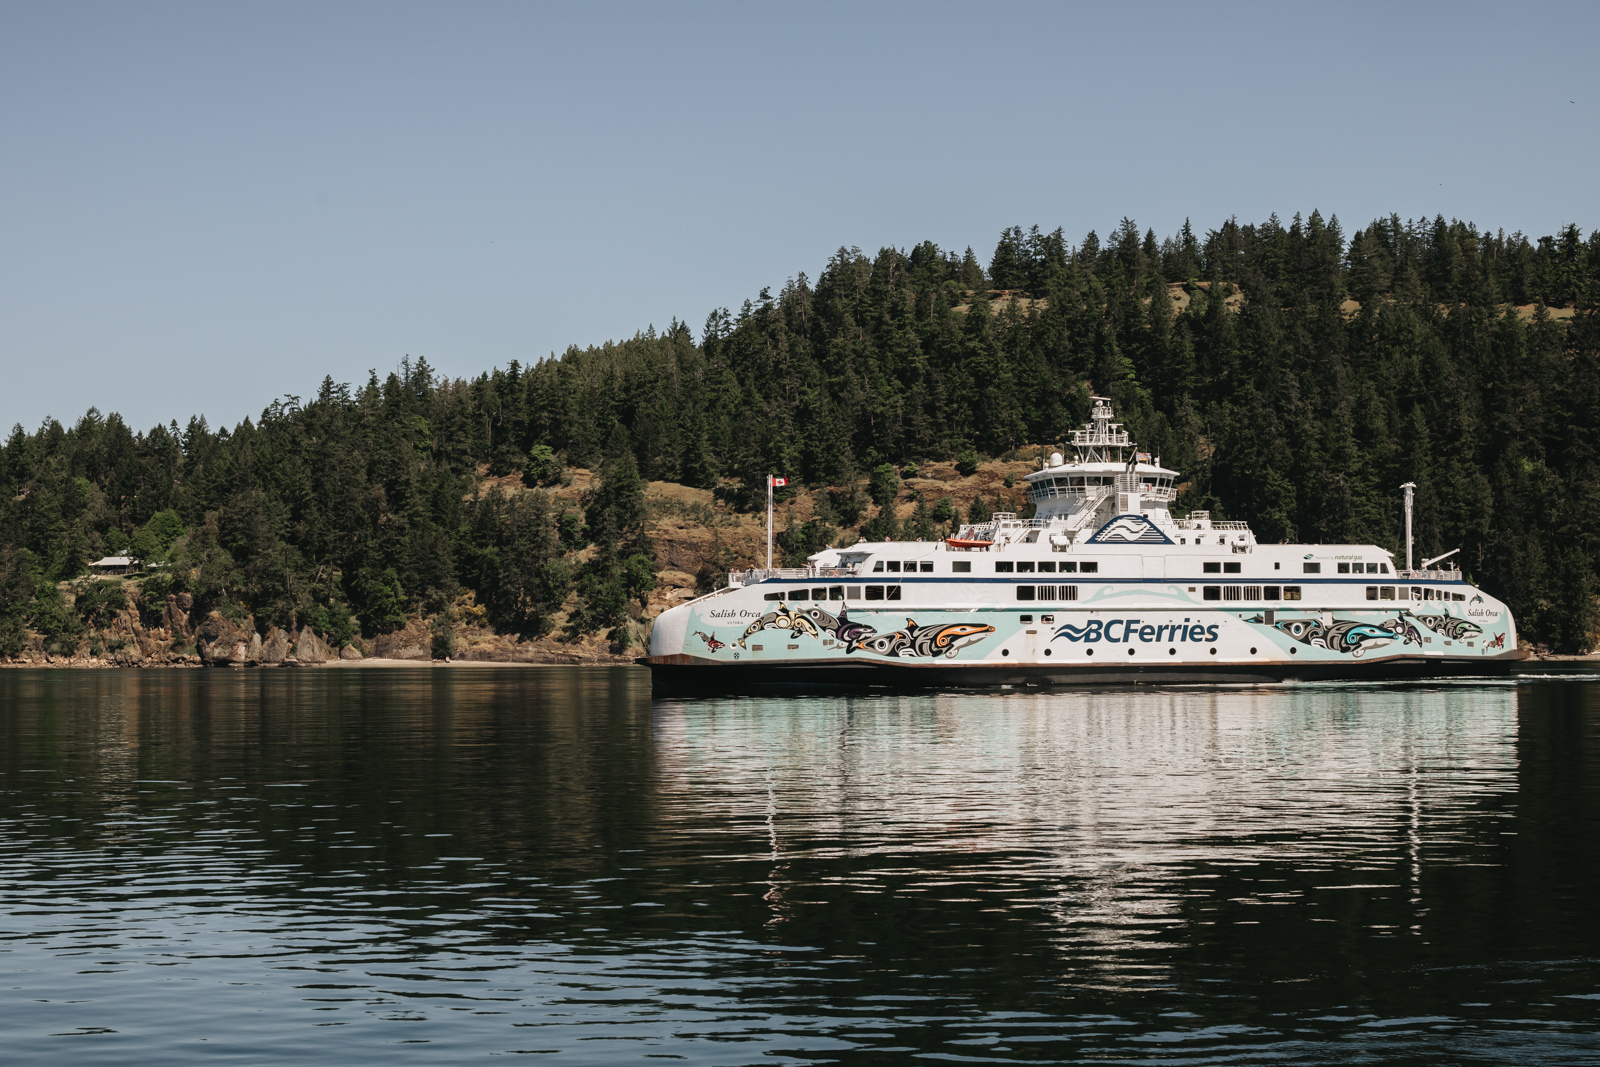 Bodega Ridge Galiano Island Wedding Photographer Kim Jay-2.jpg